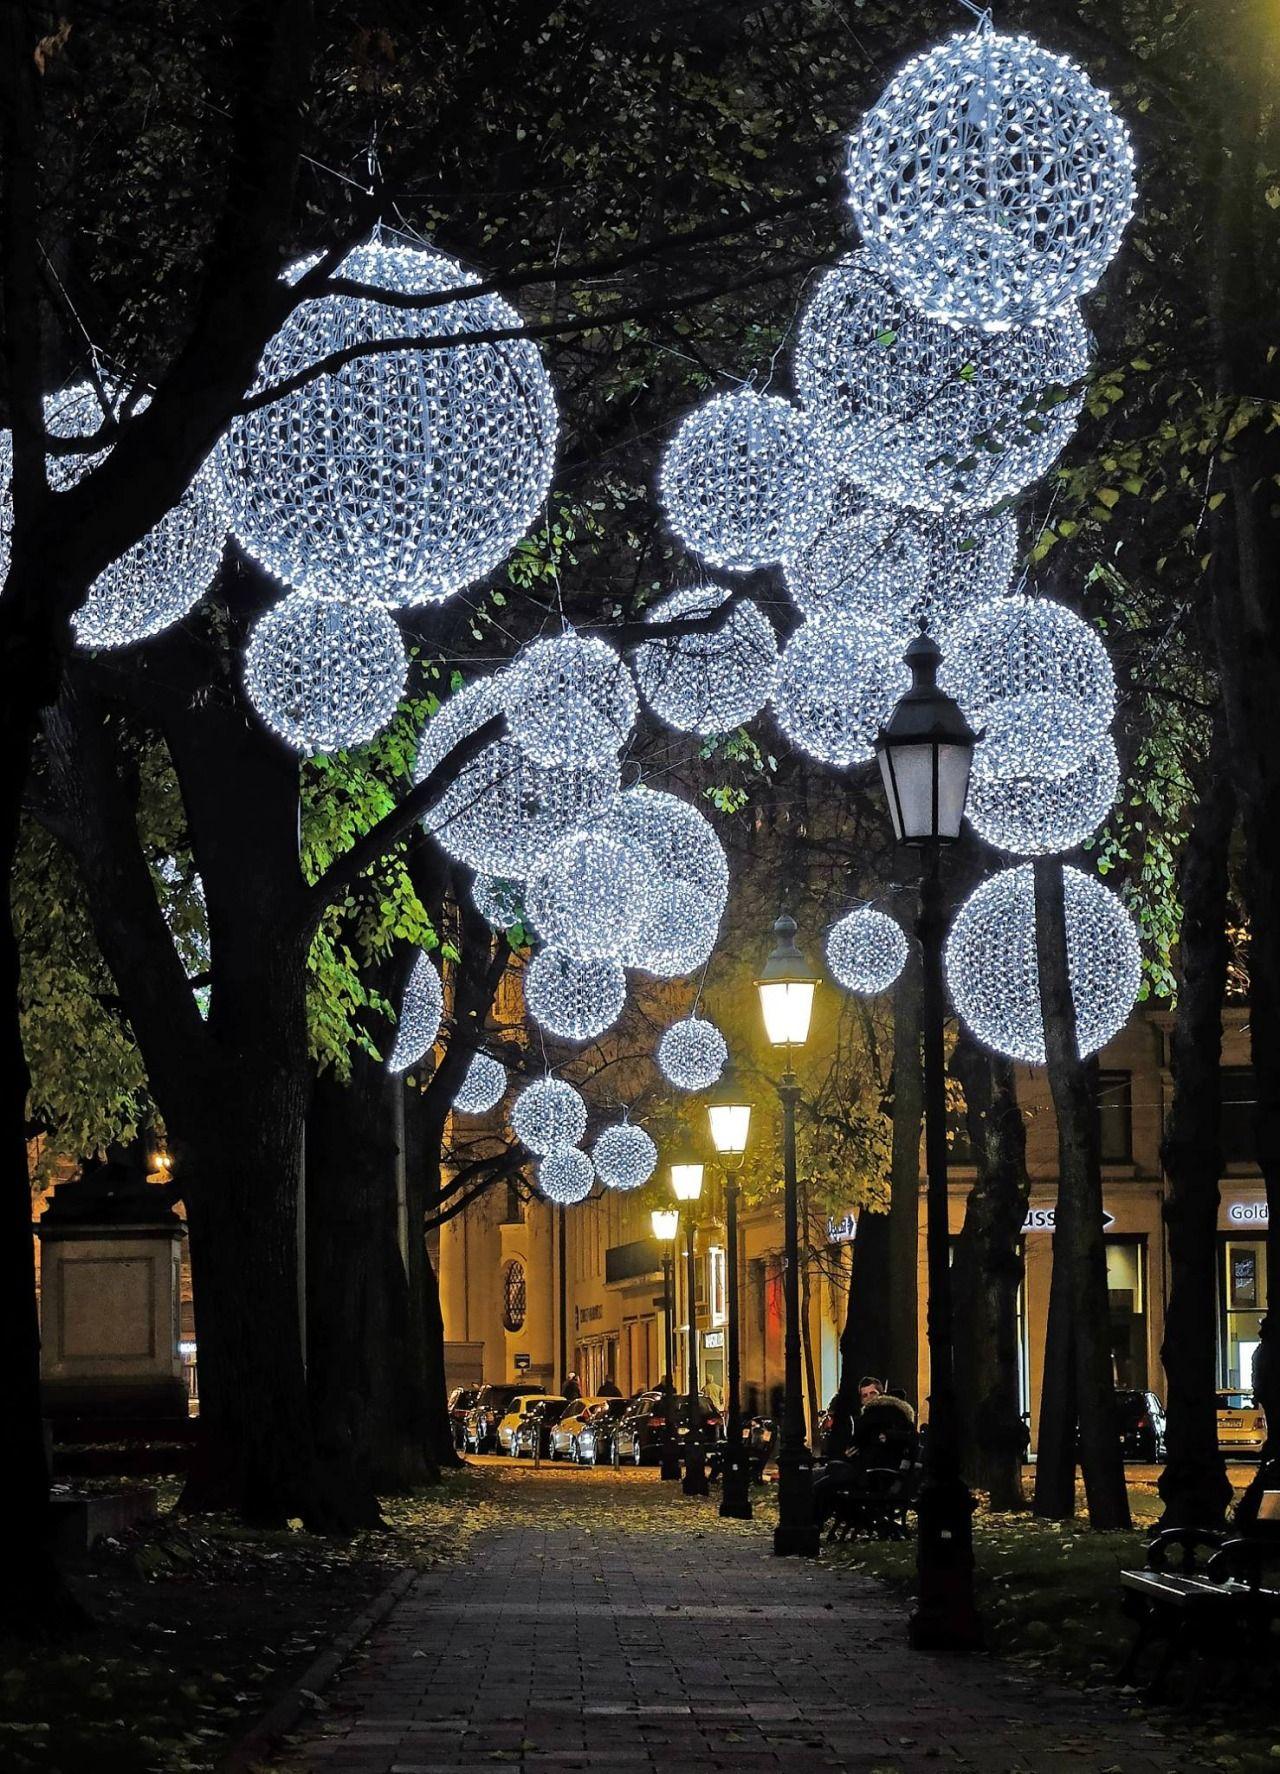 Weihnachtsbeleuchtung München.Willkommen In Germany München Bayern Southern Germany